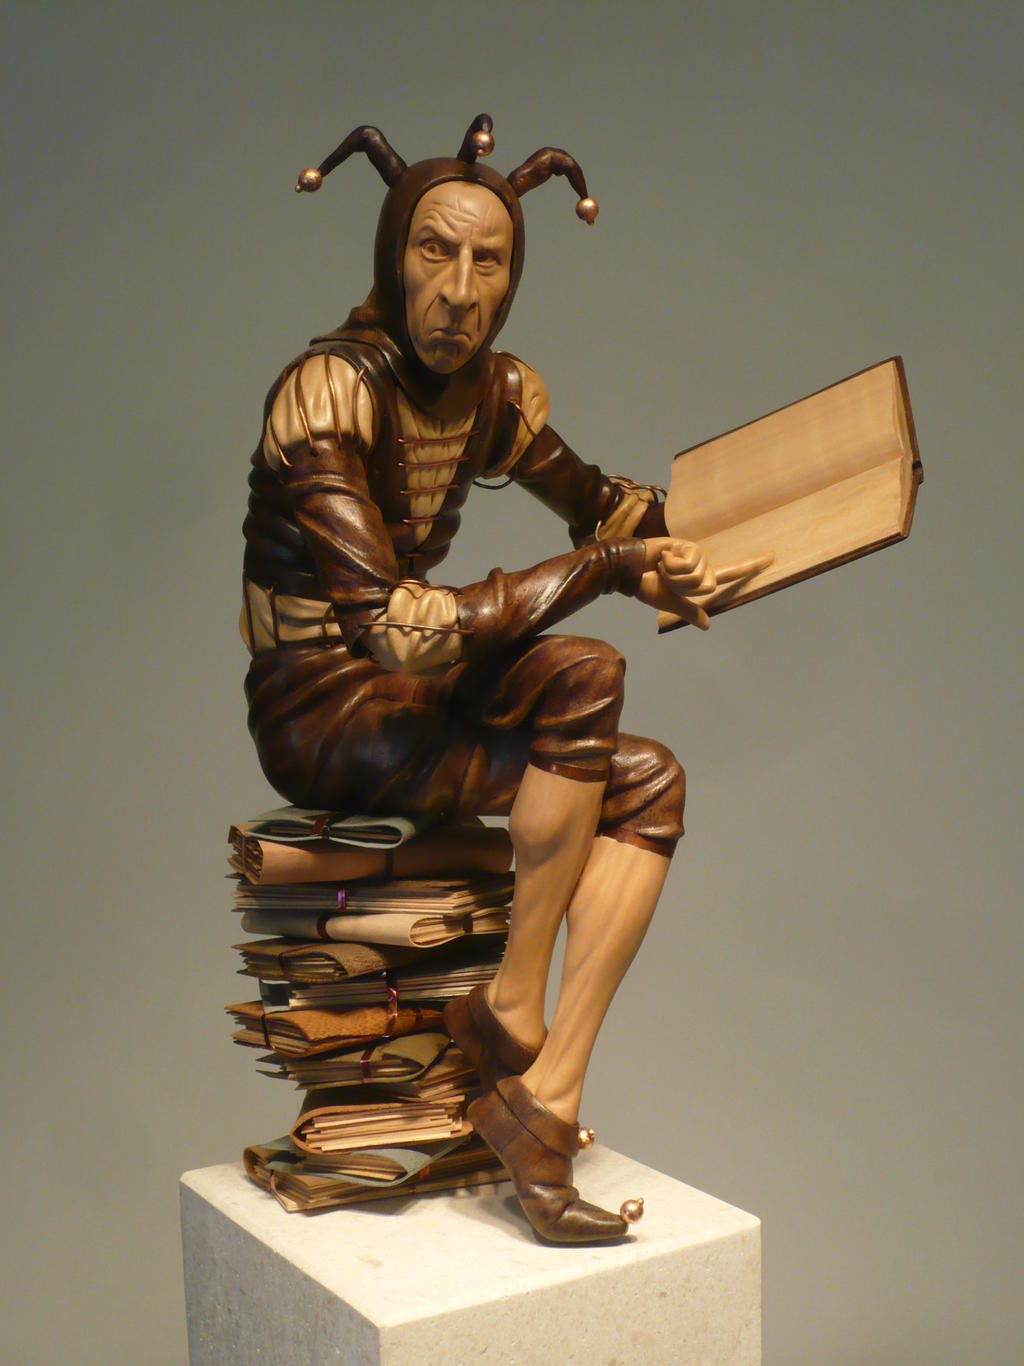 The Bureaucrat by IanNorbury